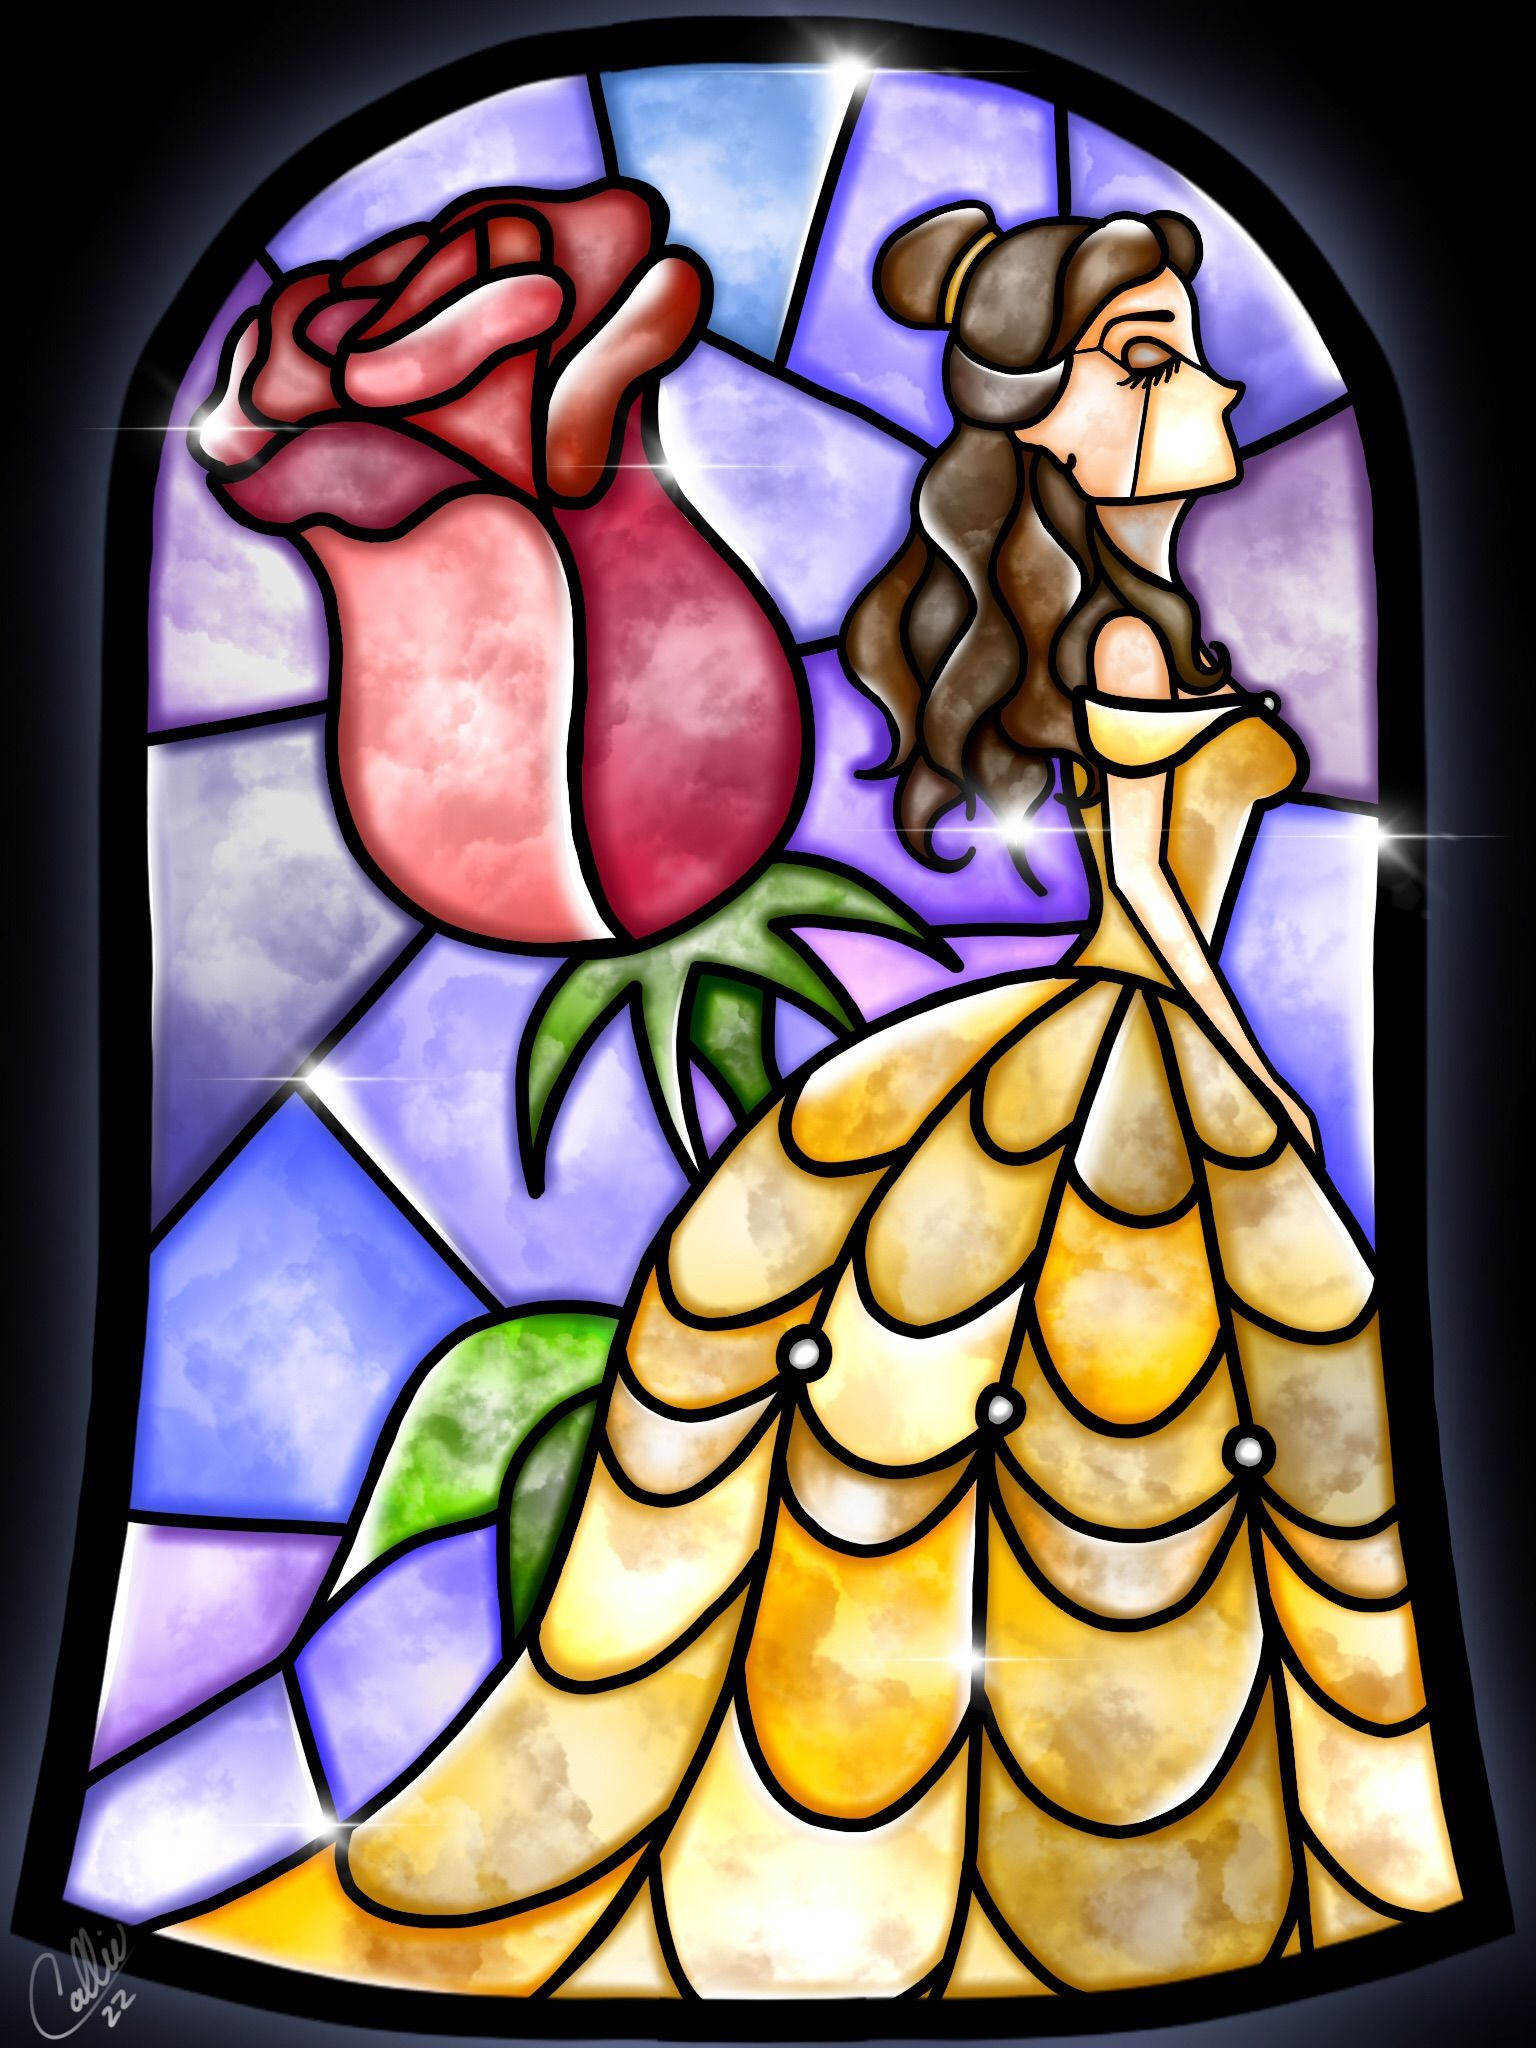 Stained Glass Belle by CallieClara.deviantart.com on @DeviantArt